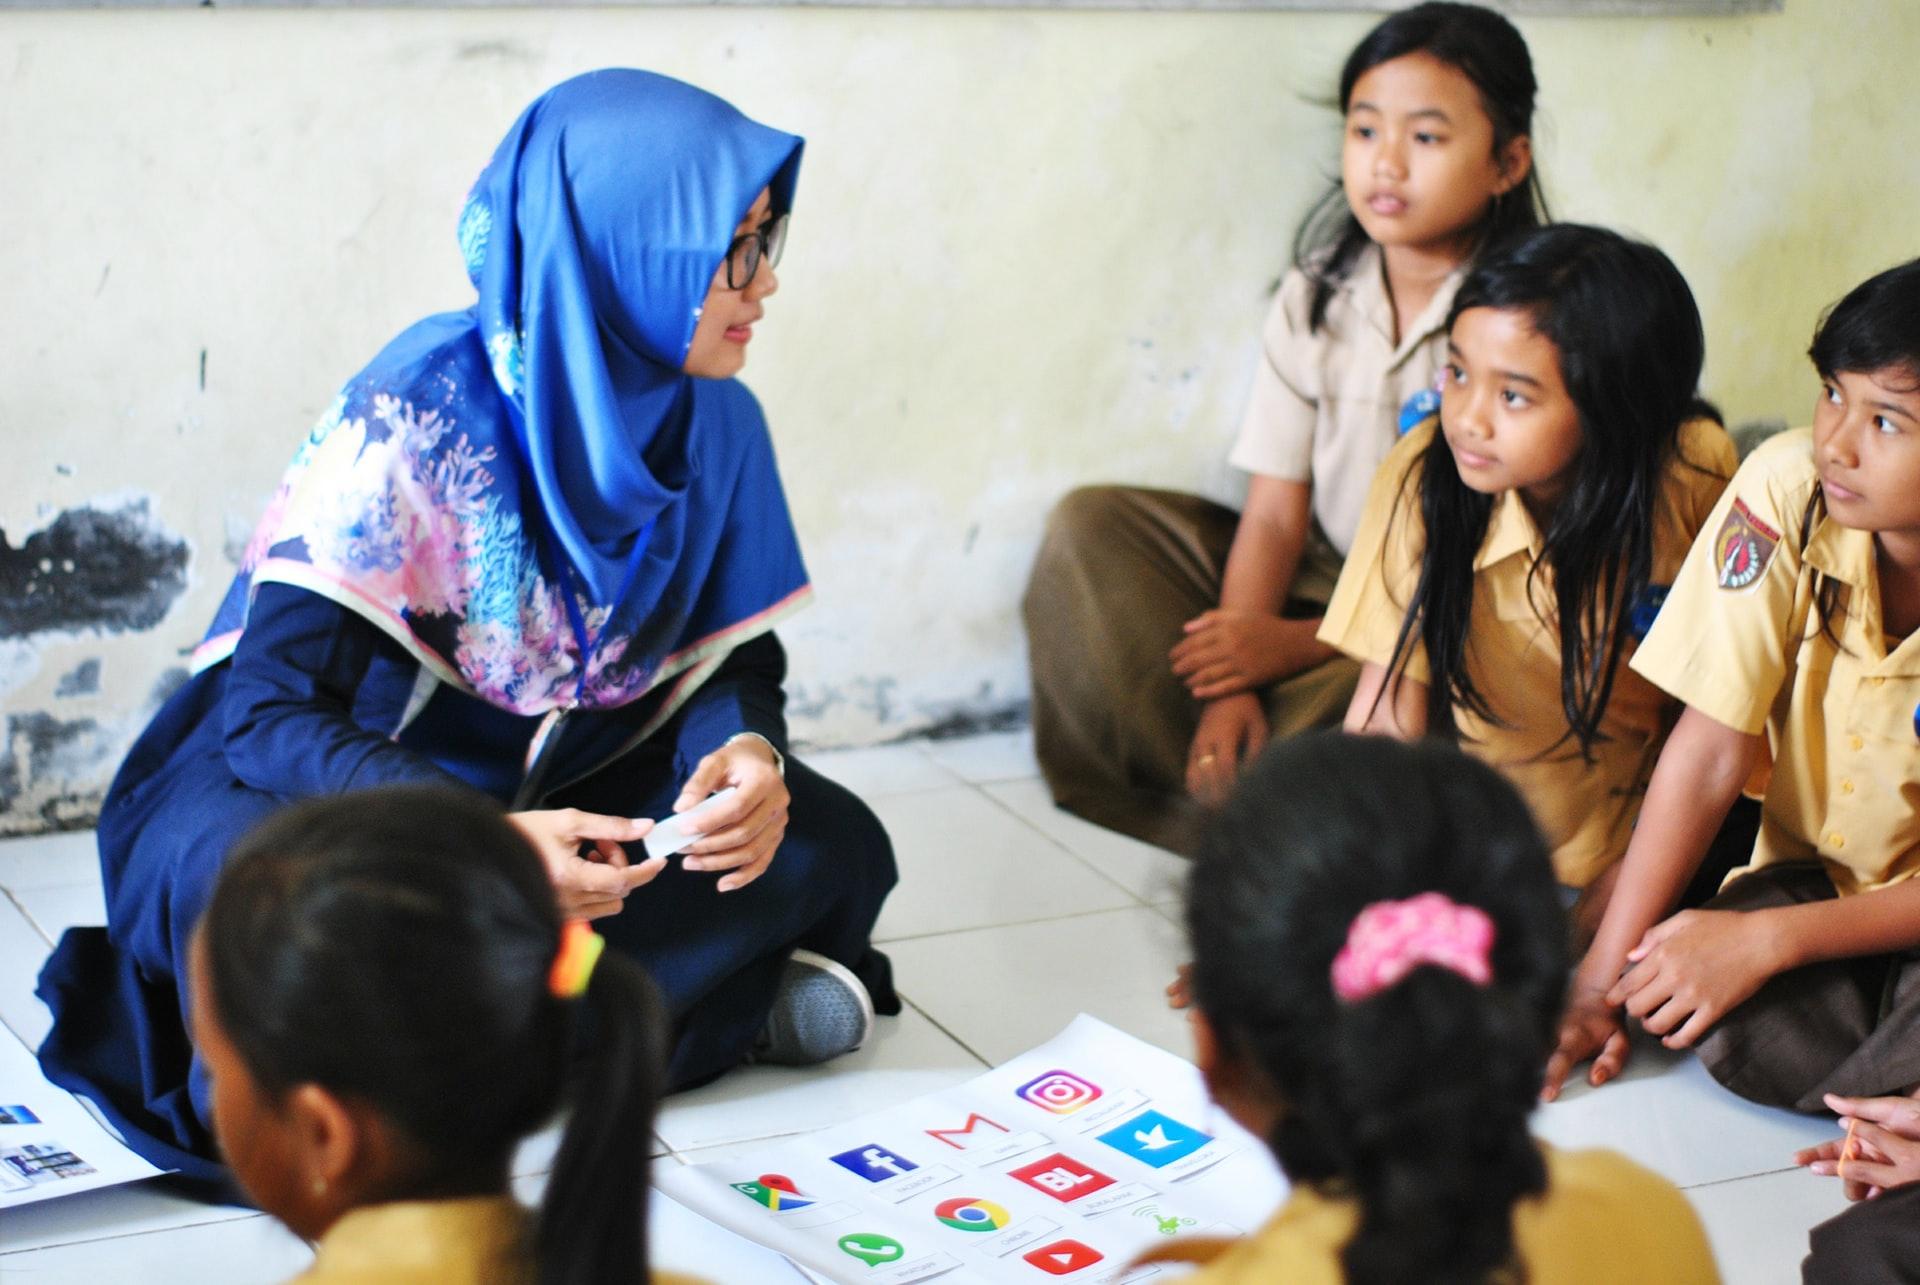 Lehrerin hält Vortrag für Kinder